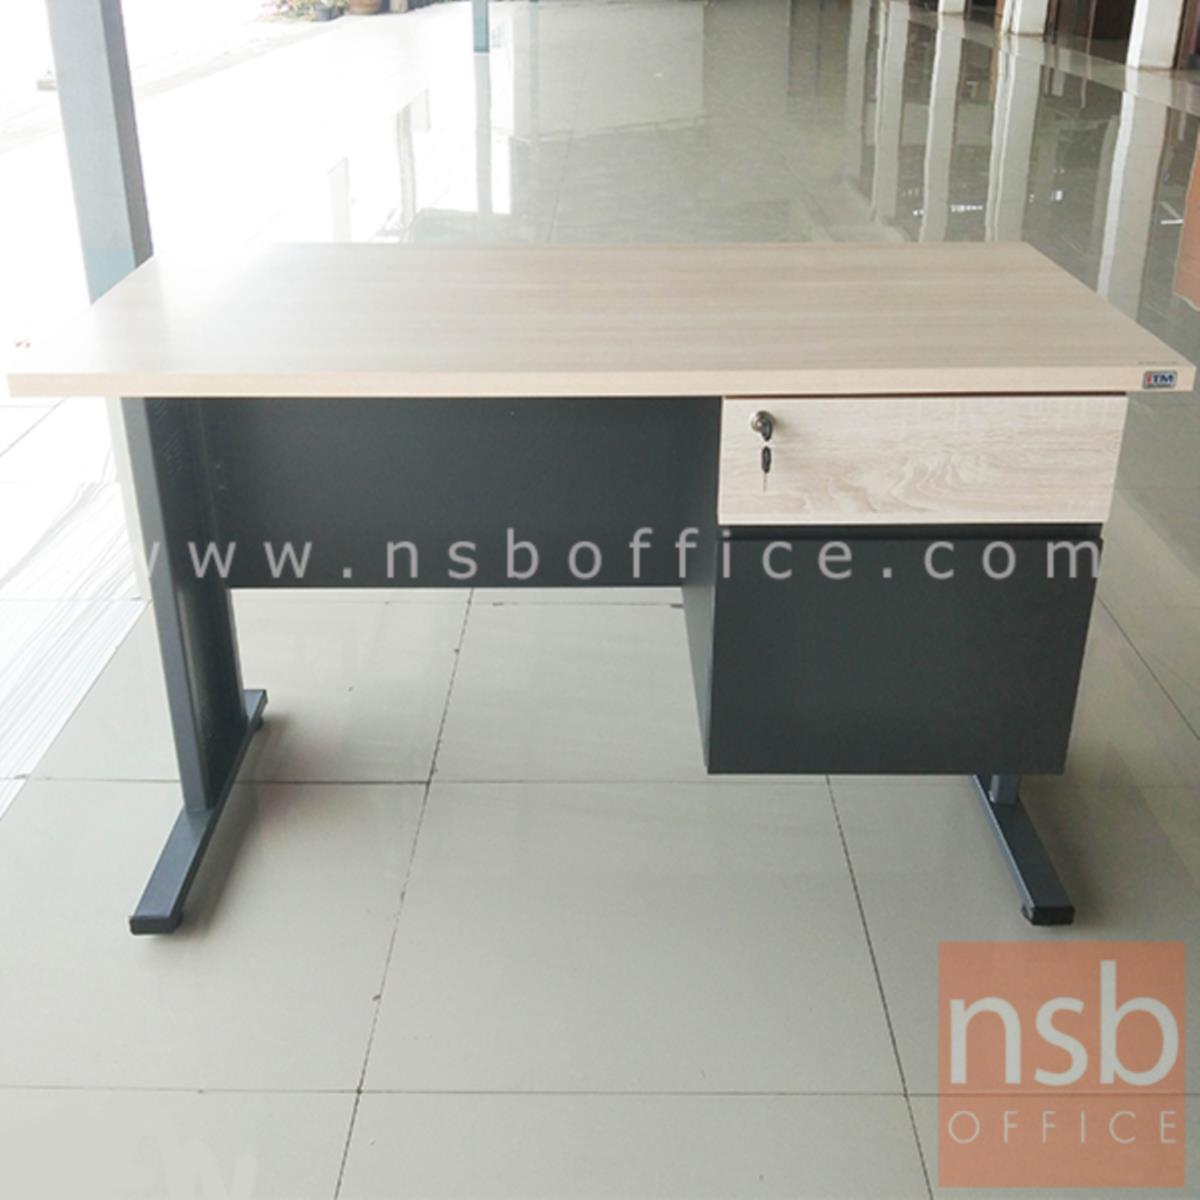 A10A066:โต๊ะทำงาน 2 ลิ้นชัก  รุ่น Symbiote (ซิมไบโอต) ขนาด 120W cm. ขาเหล็ก  สีโซลิคตัดเทาเข้มหรือสีมูจิตัดเทาเข้ม